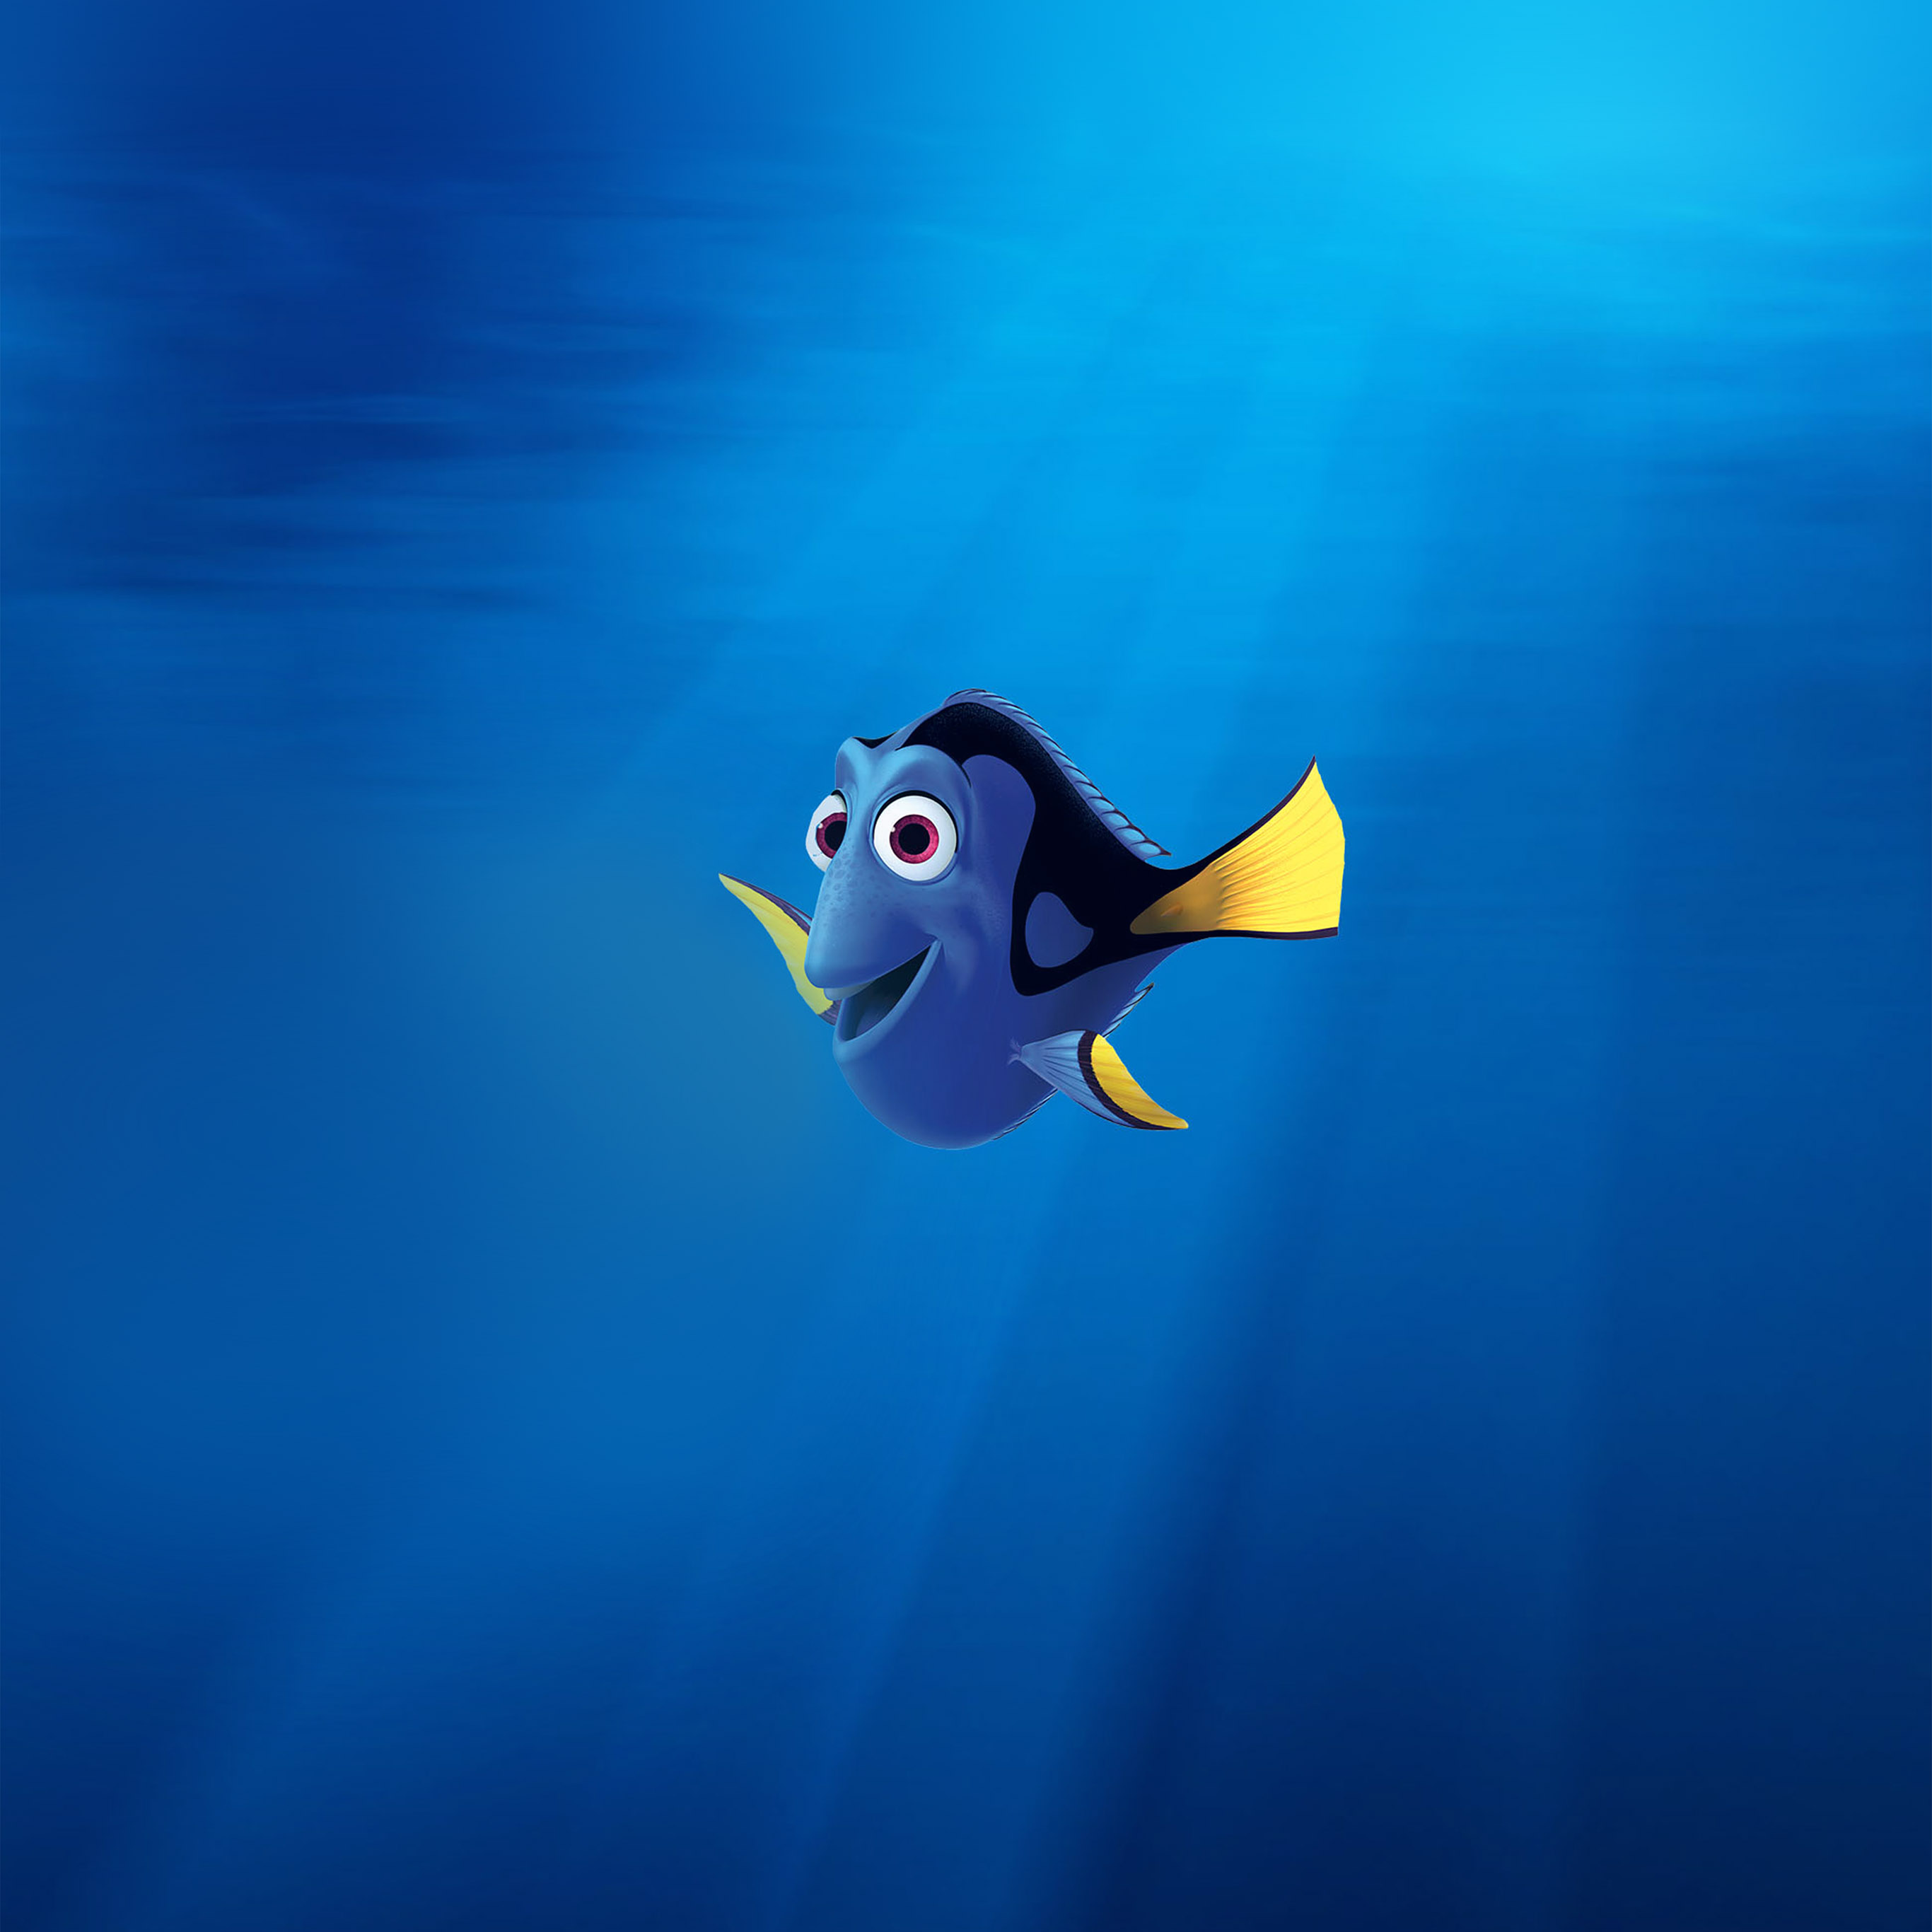 Evo 8 Hd Wallpaper Aq99 Finding Nemo Dory Disney Art Wallpaper